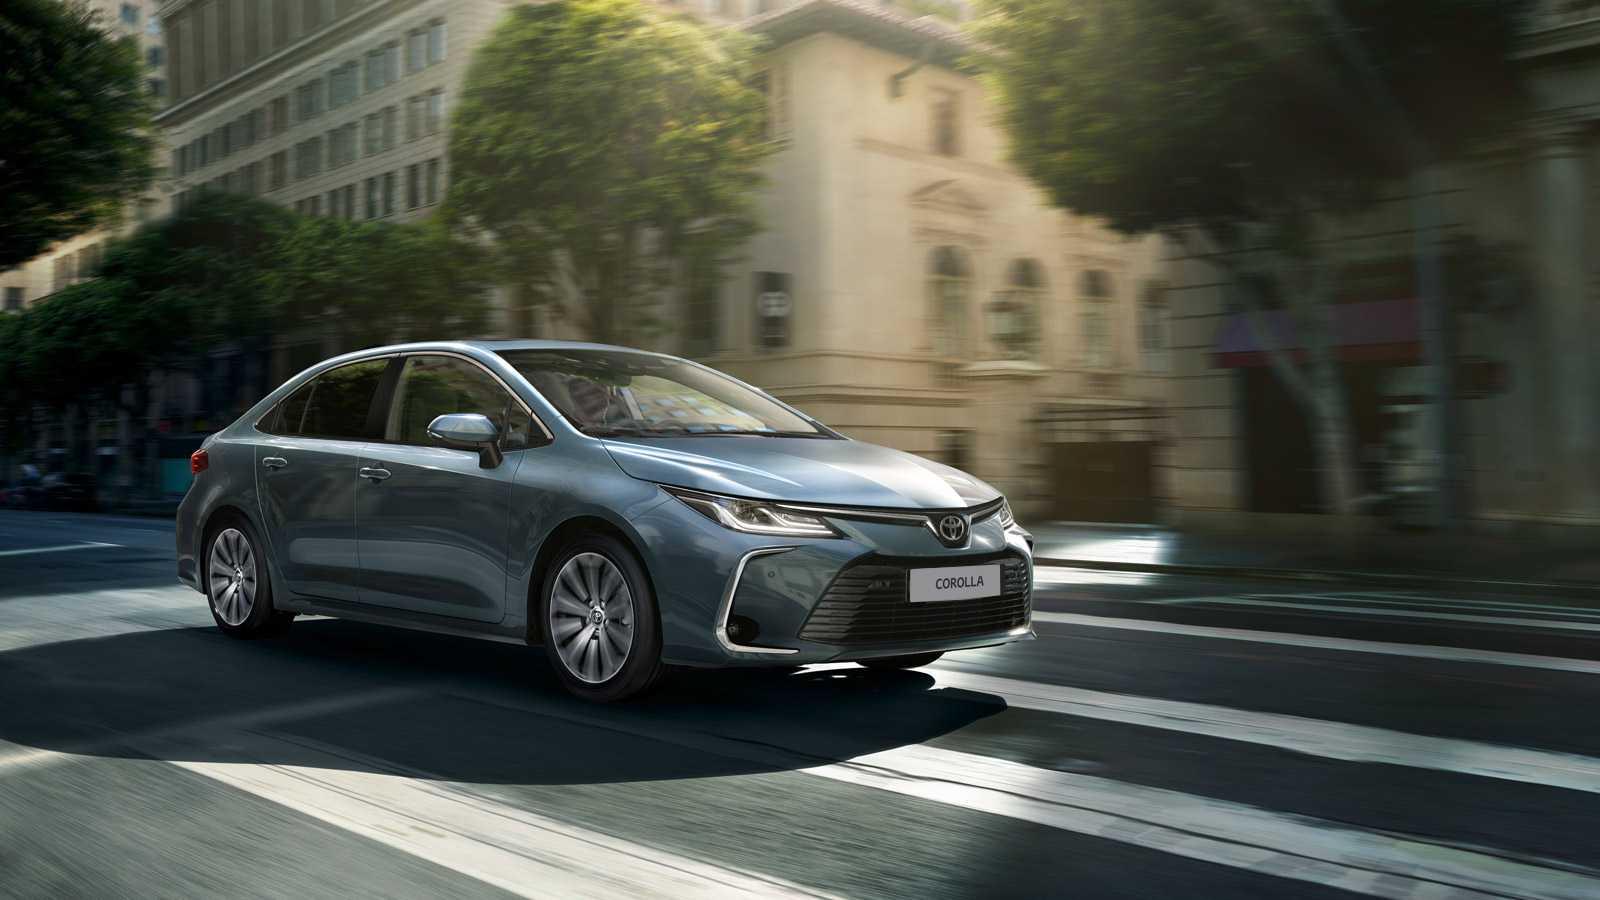 Toyota corolla 2012, 2013, 2014, 2015, 2016, седан, 11 поколение, e180 технические характеристики и комплектации